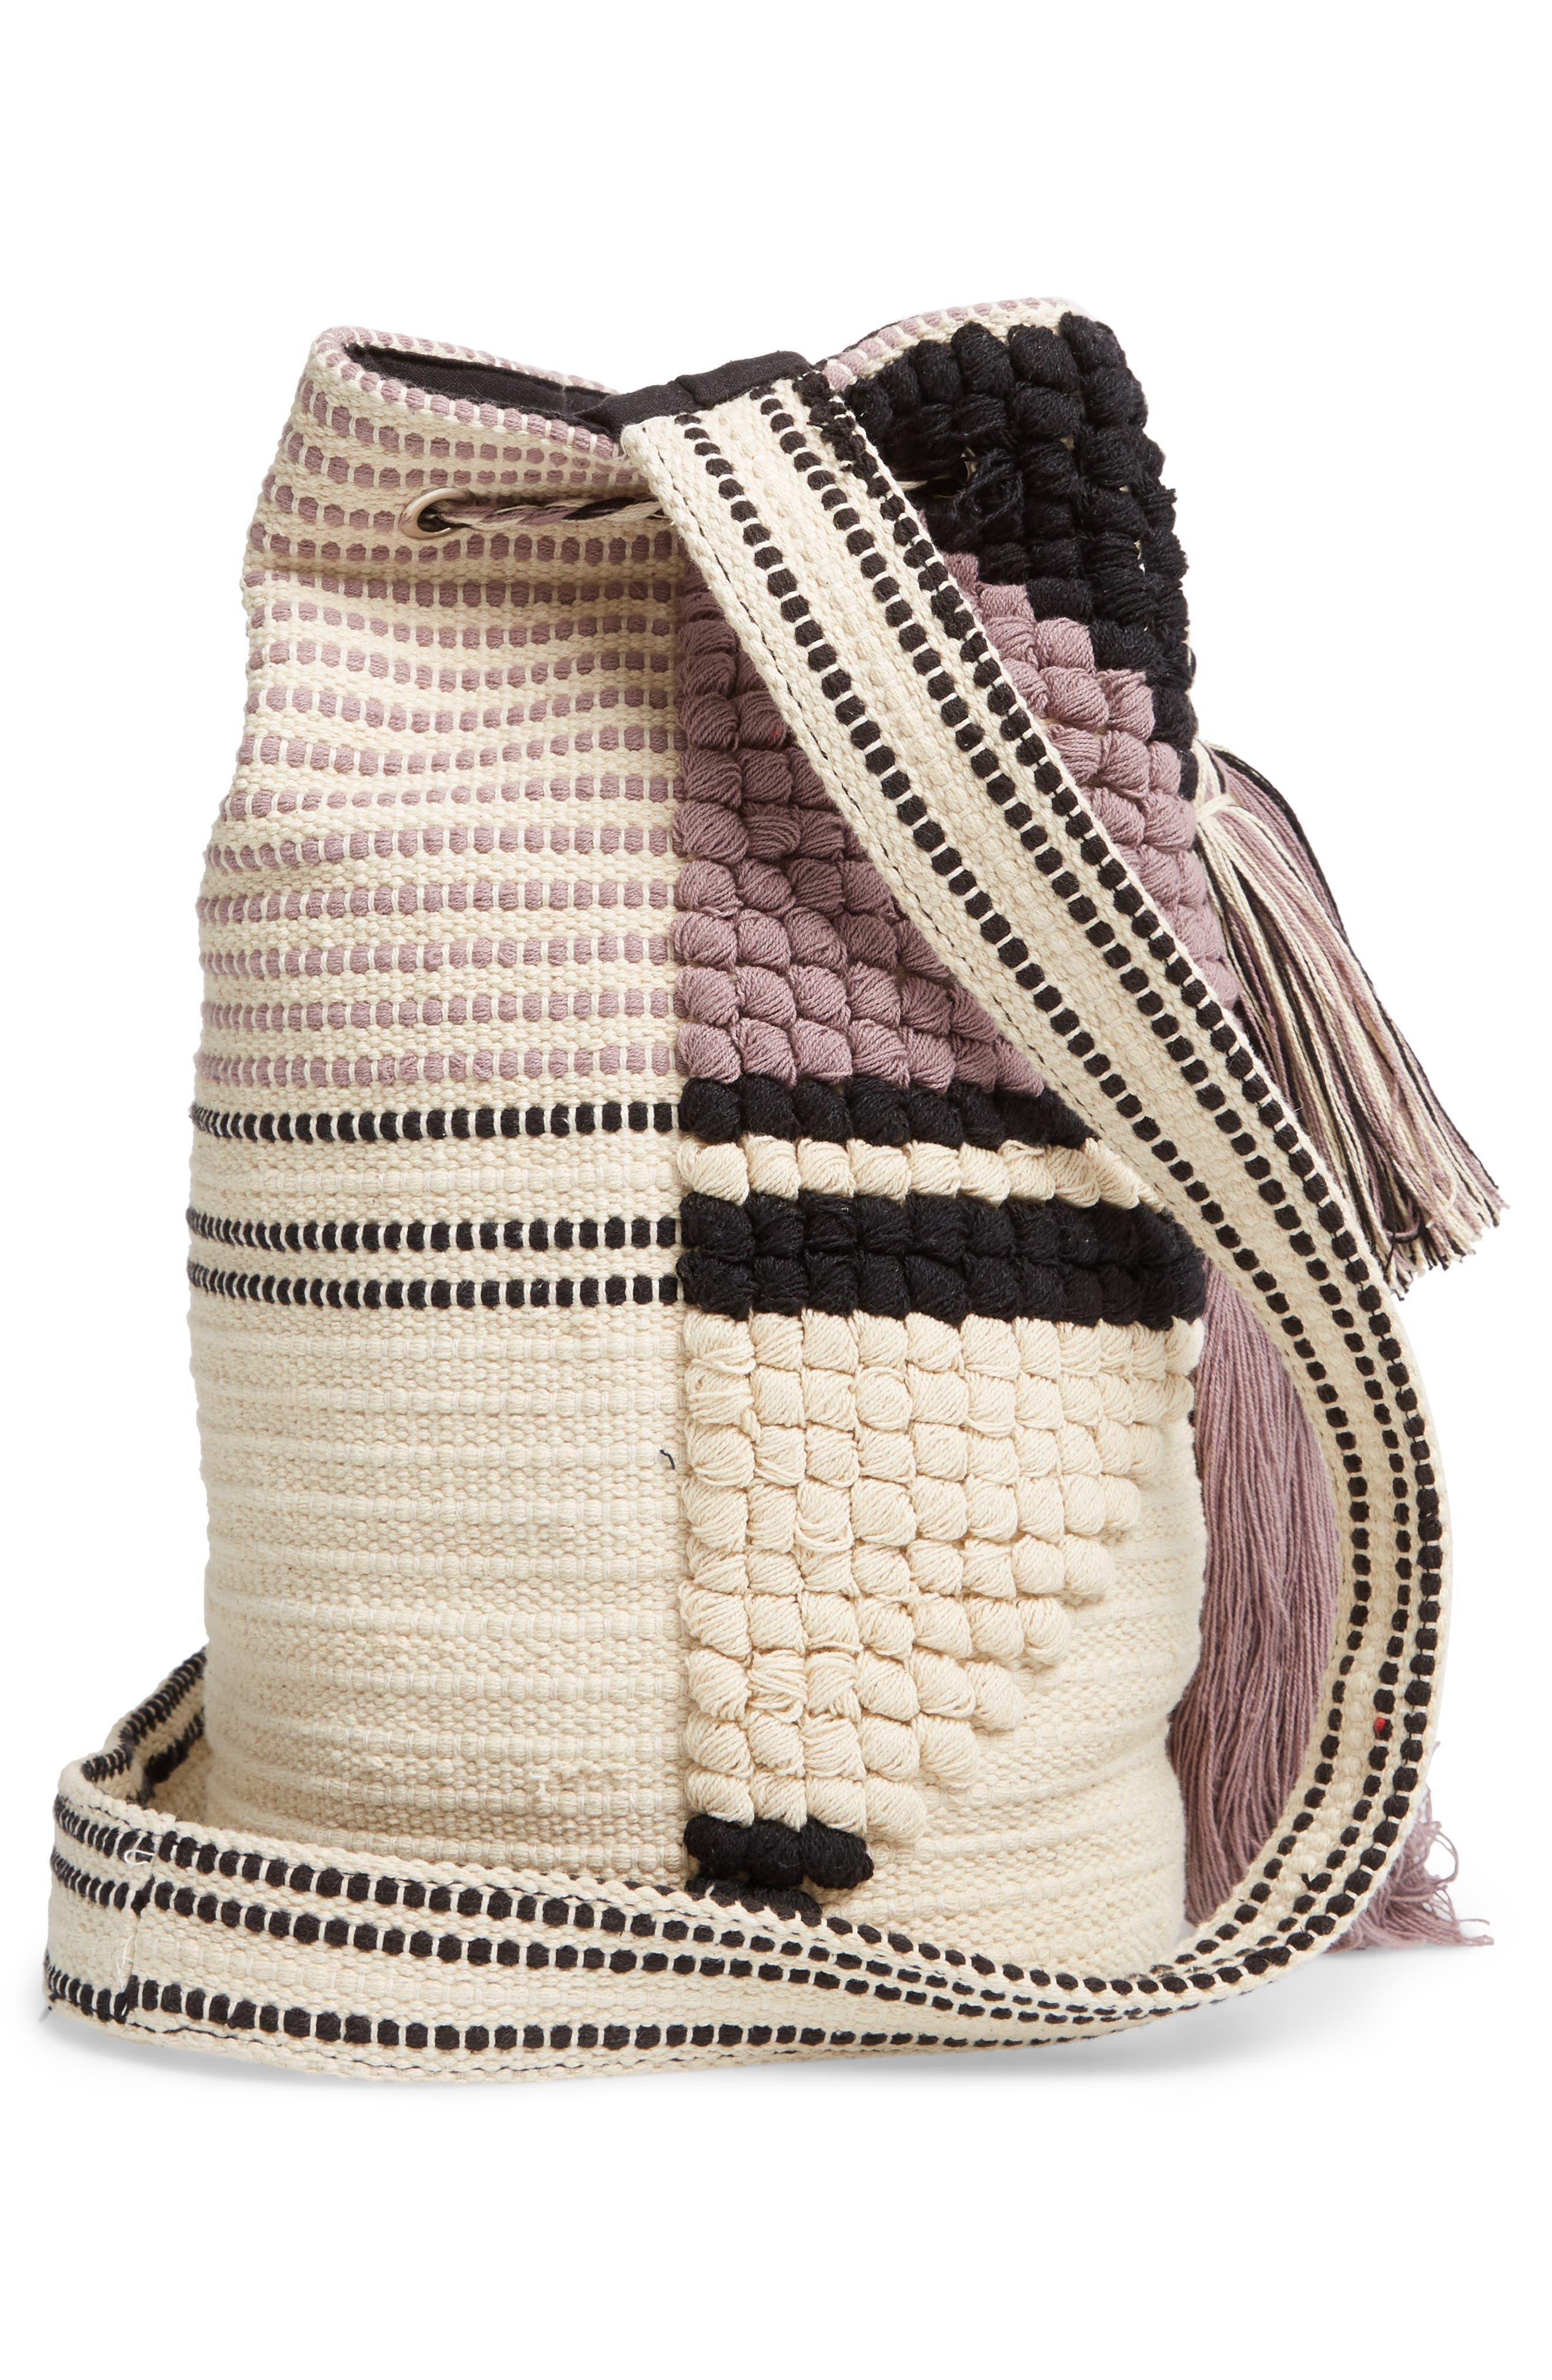 SOLE SOCIETY, Halay Woven Bucket Bag, Alternate thumbnail 6, color, 001